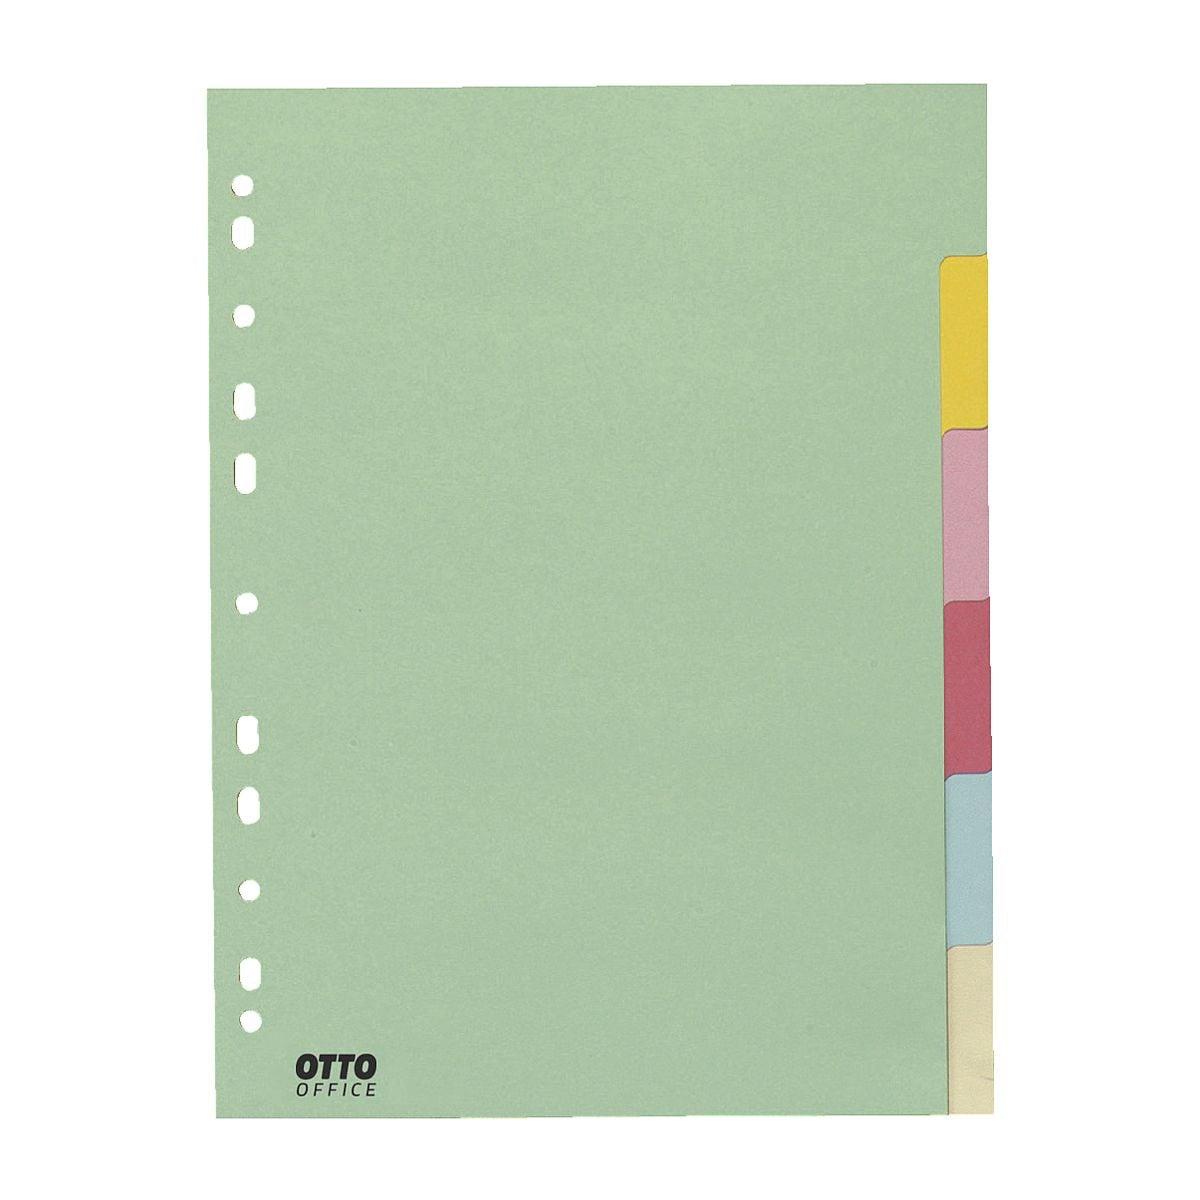 OTTO Office Register, A4, blanko 6-teilig, Pastellfarben, Recycling-Karton